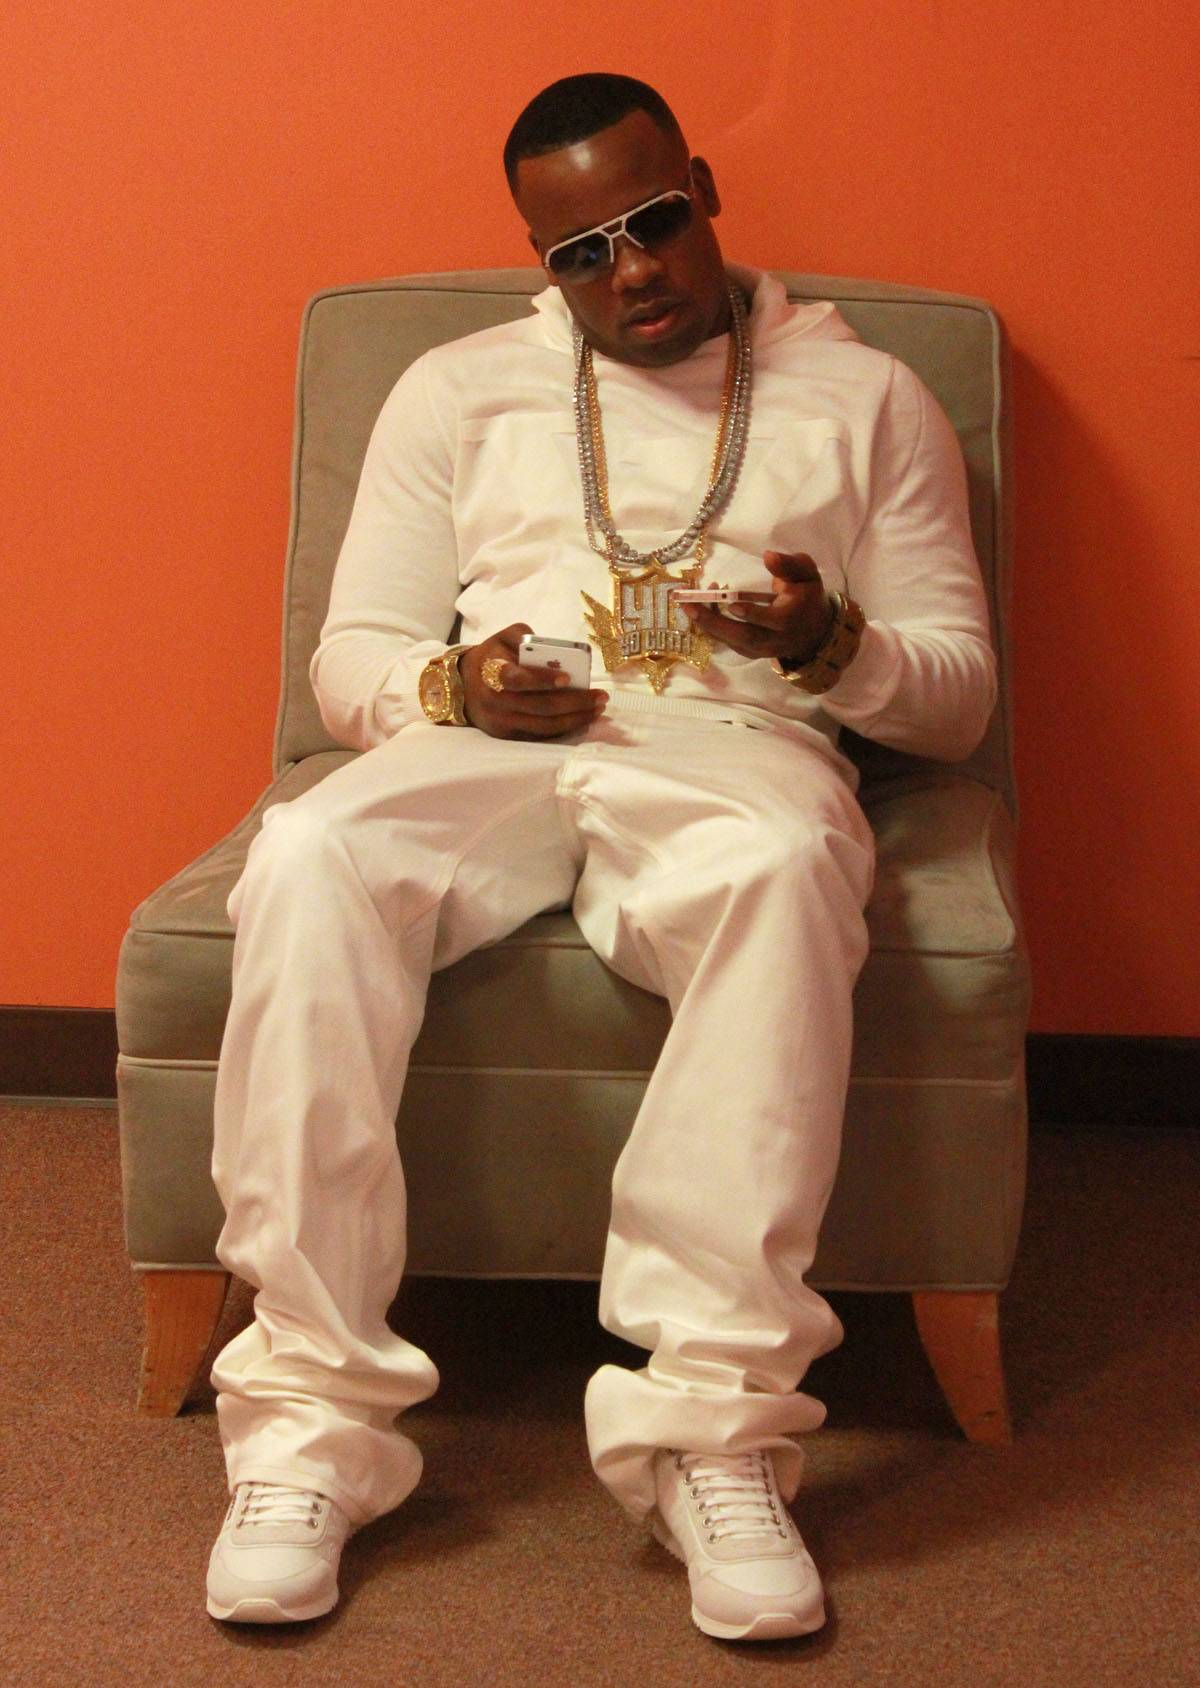 Tonight, It's All About Him - Don't miss Yo Gotti live tonight on 106 & Park!(Photo: Slim/BET)